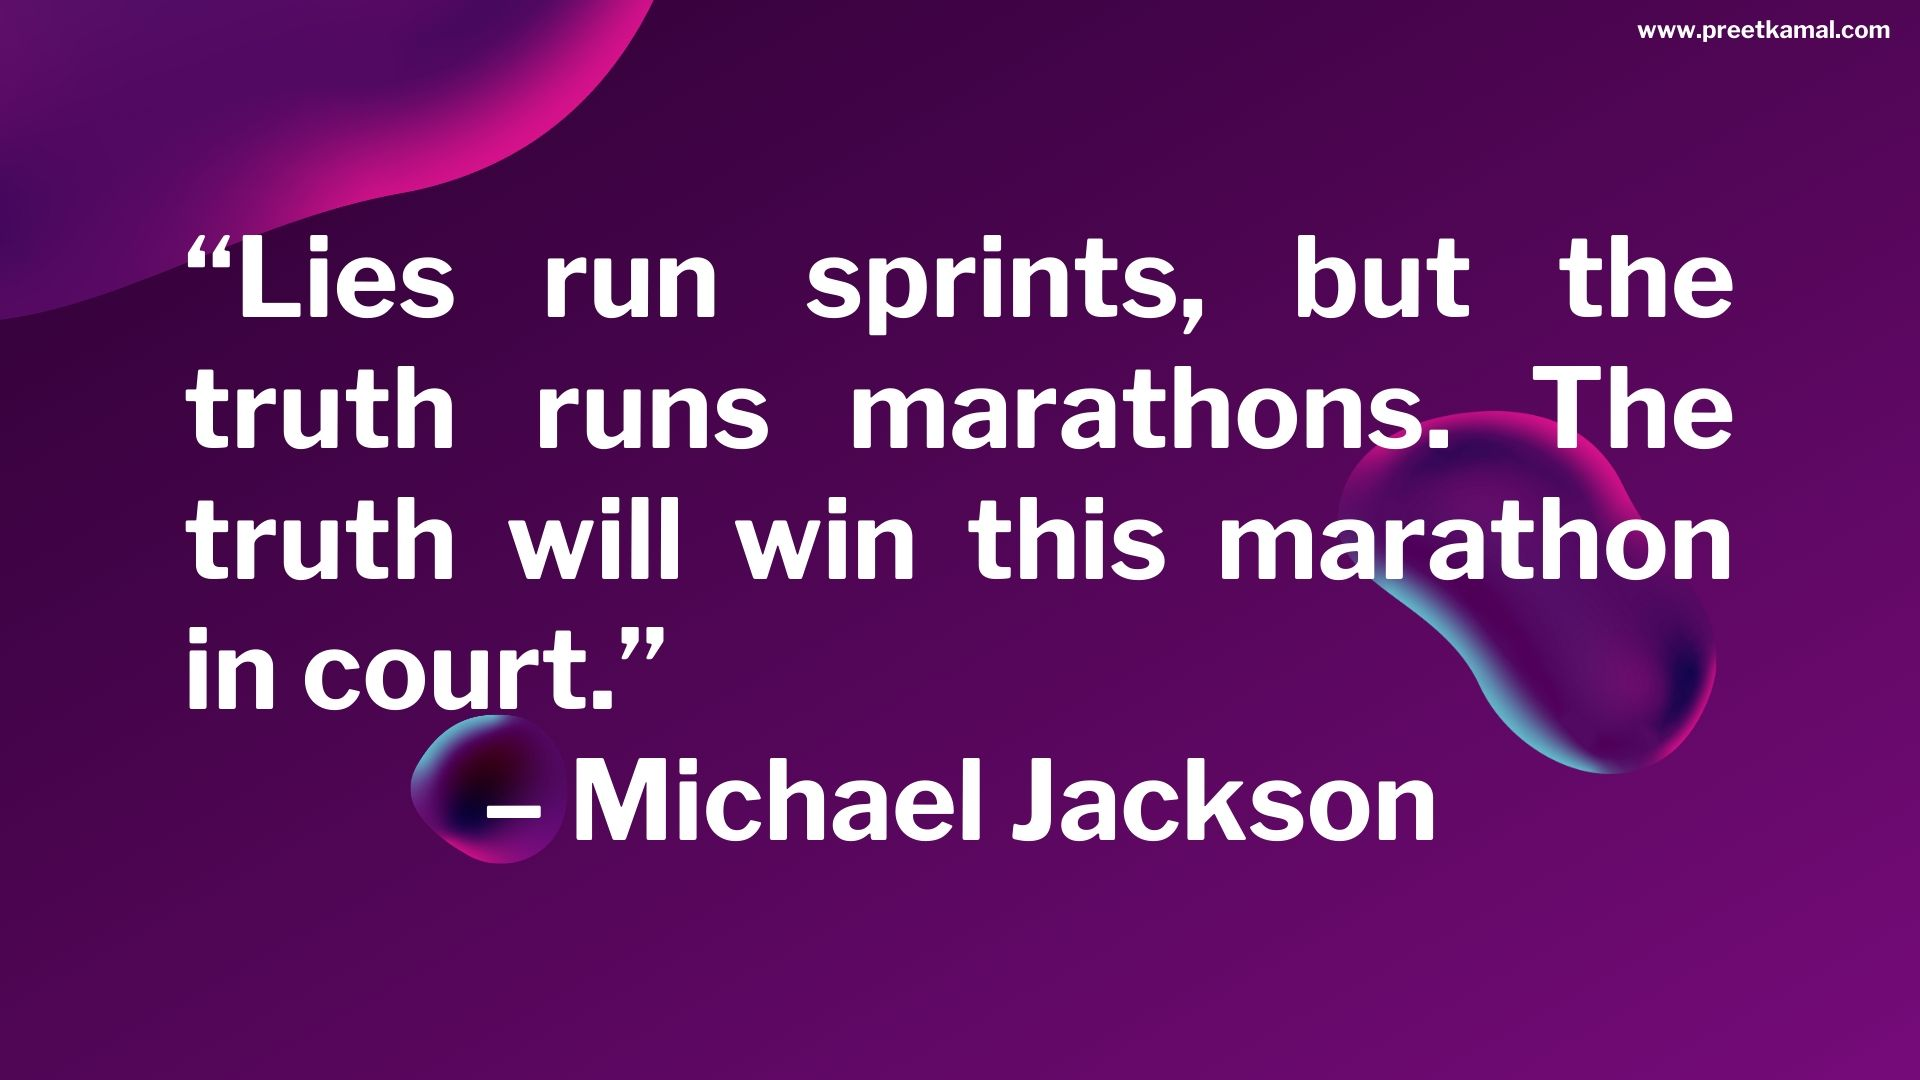 Michael Jackson Quotes (8)